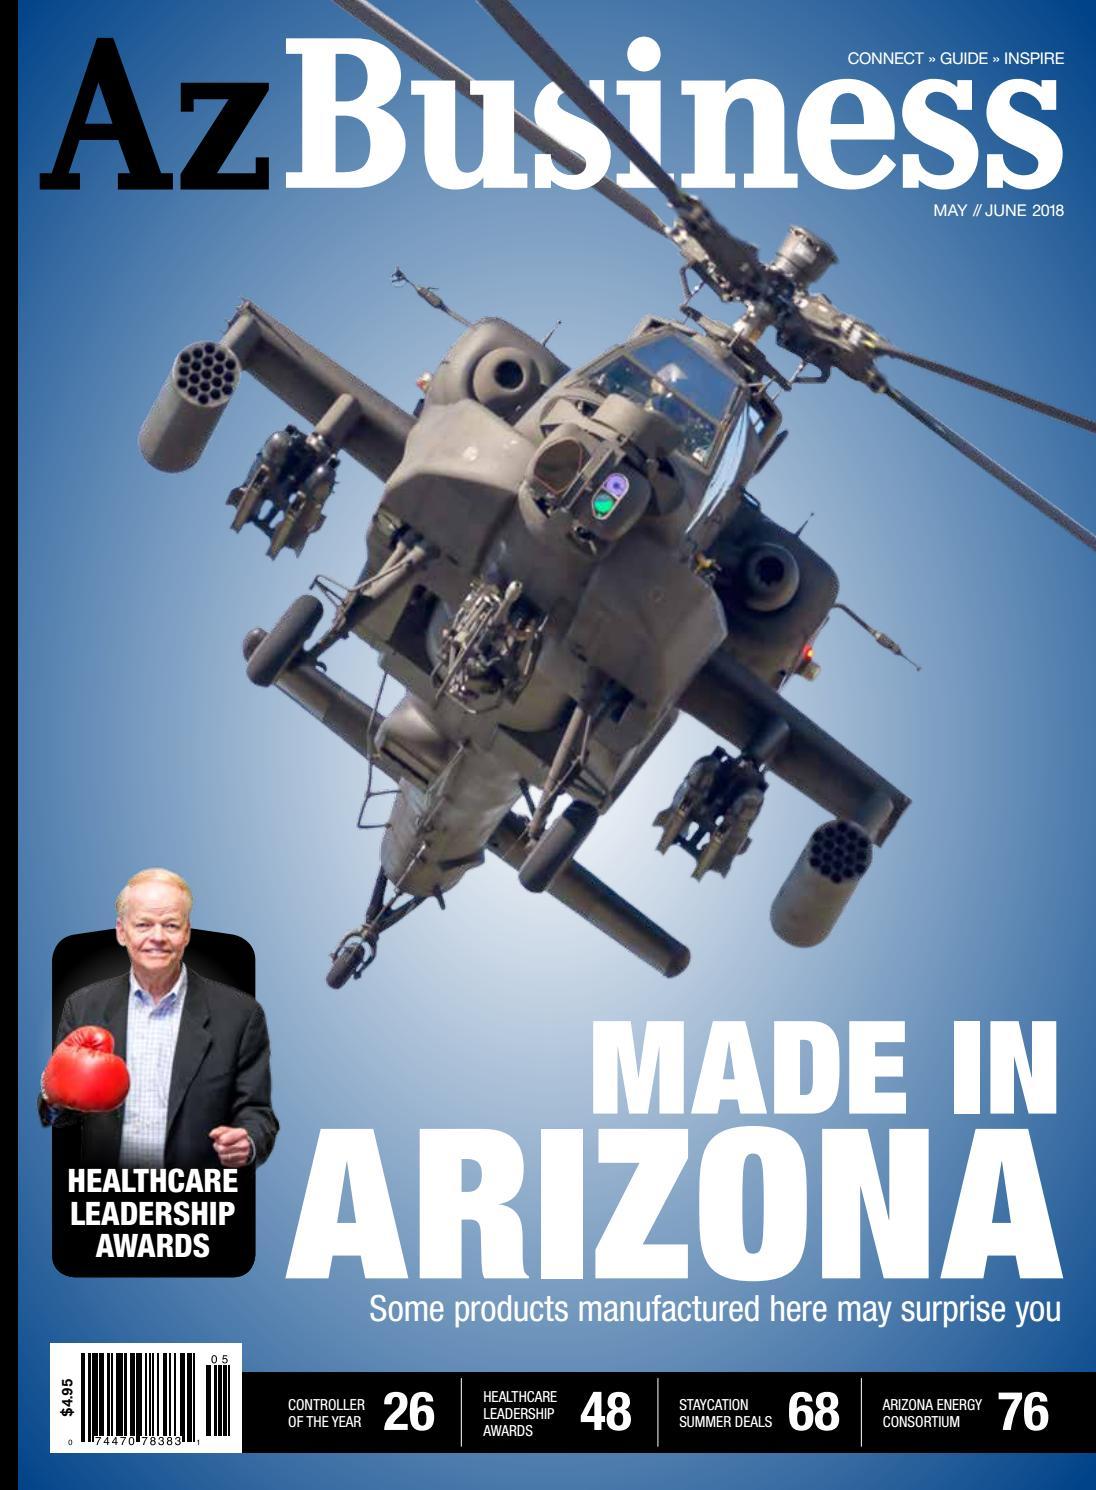 AZBusiness May/June 2018 by AZ Big Media - issuu